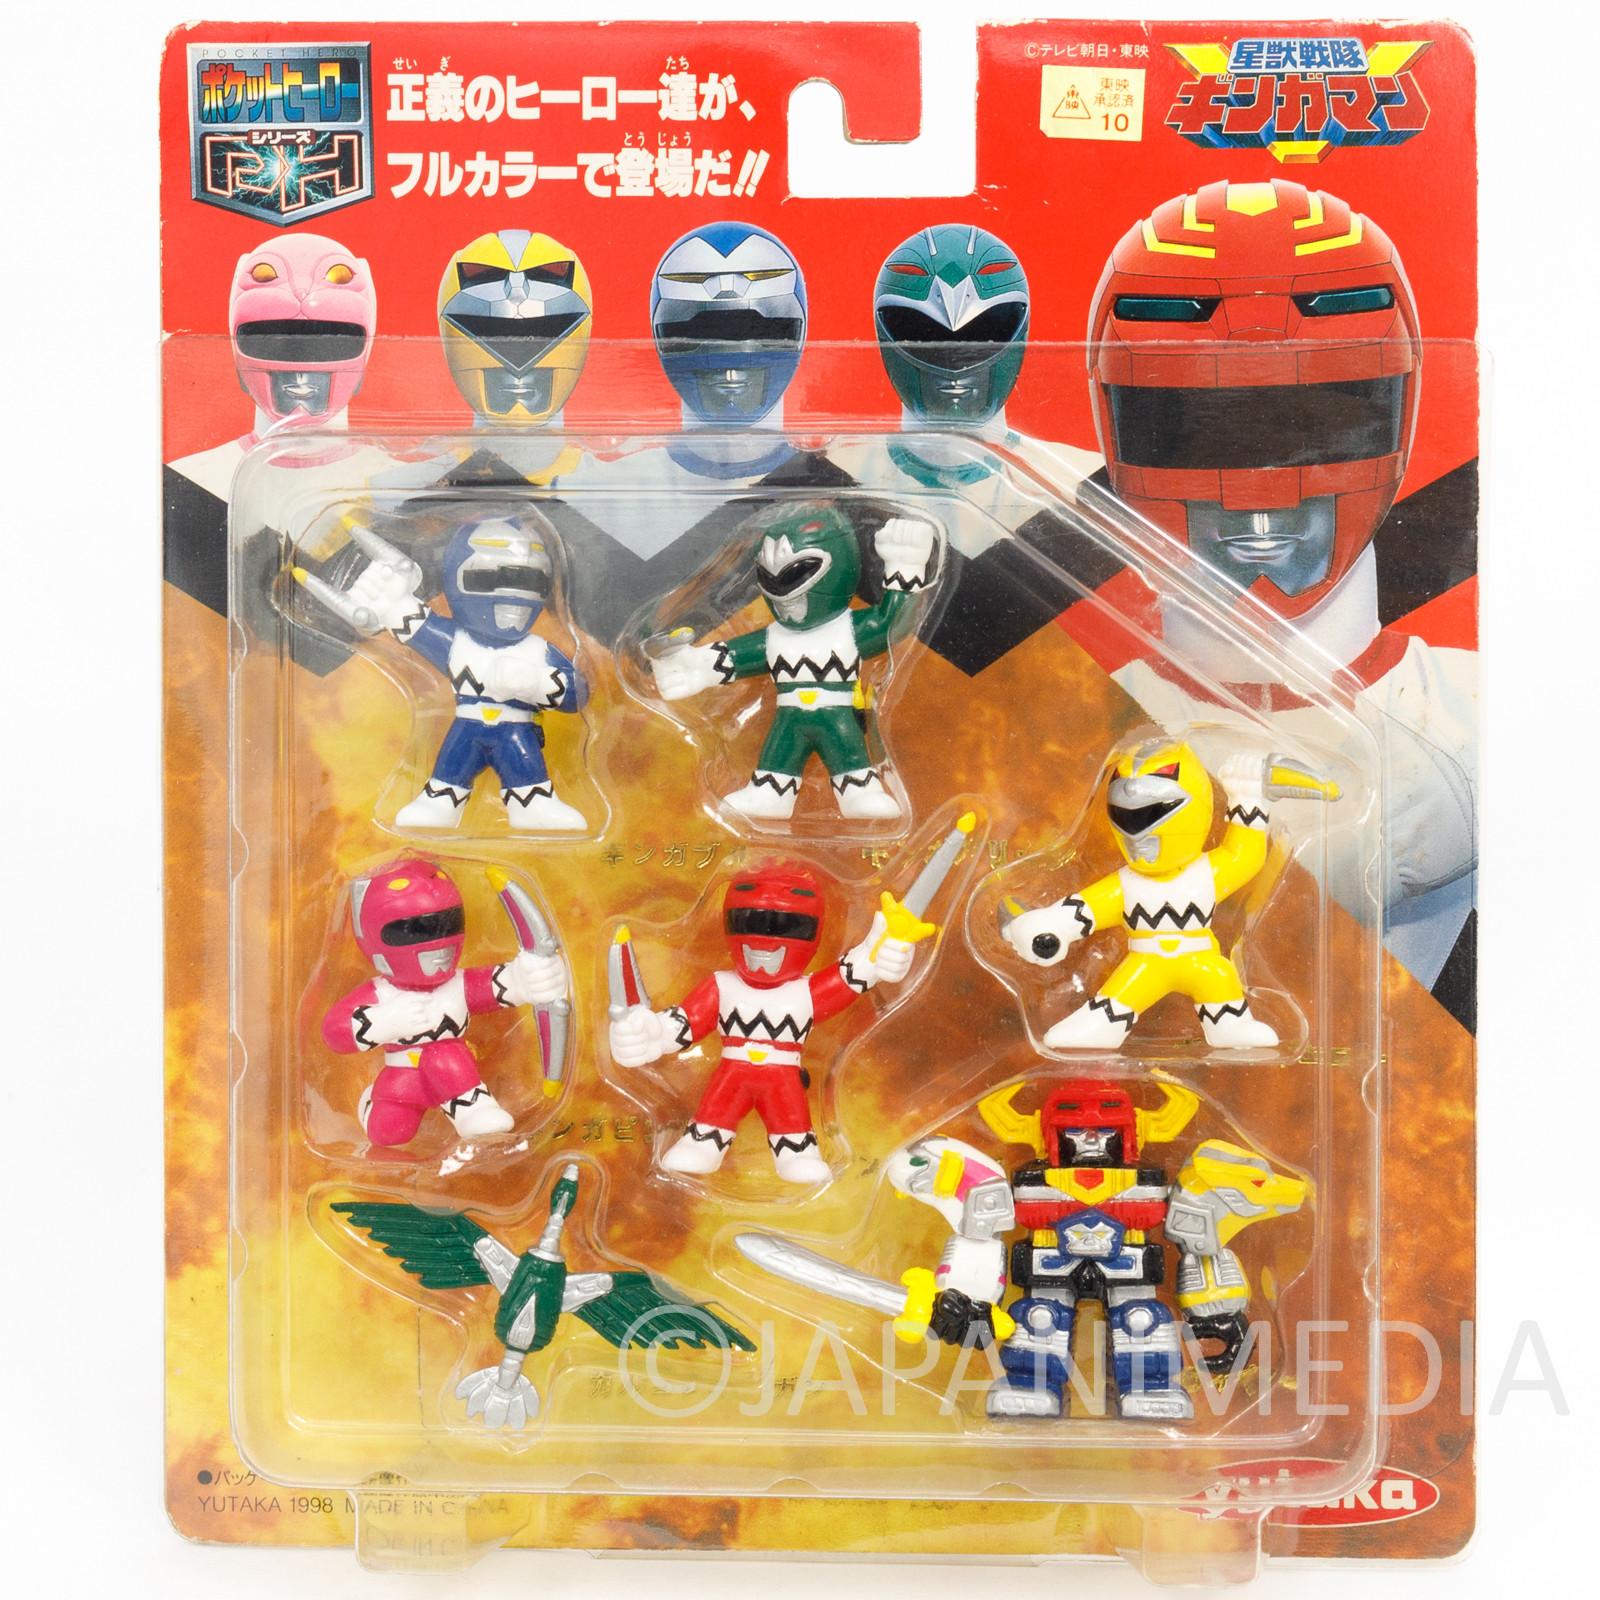 Seijuu Sentai Gingaman Pocket Heroes Figure Set JAPAN ANIME MANGA TOKUSATSU